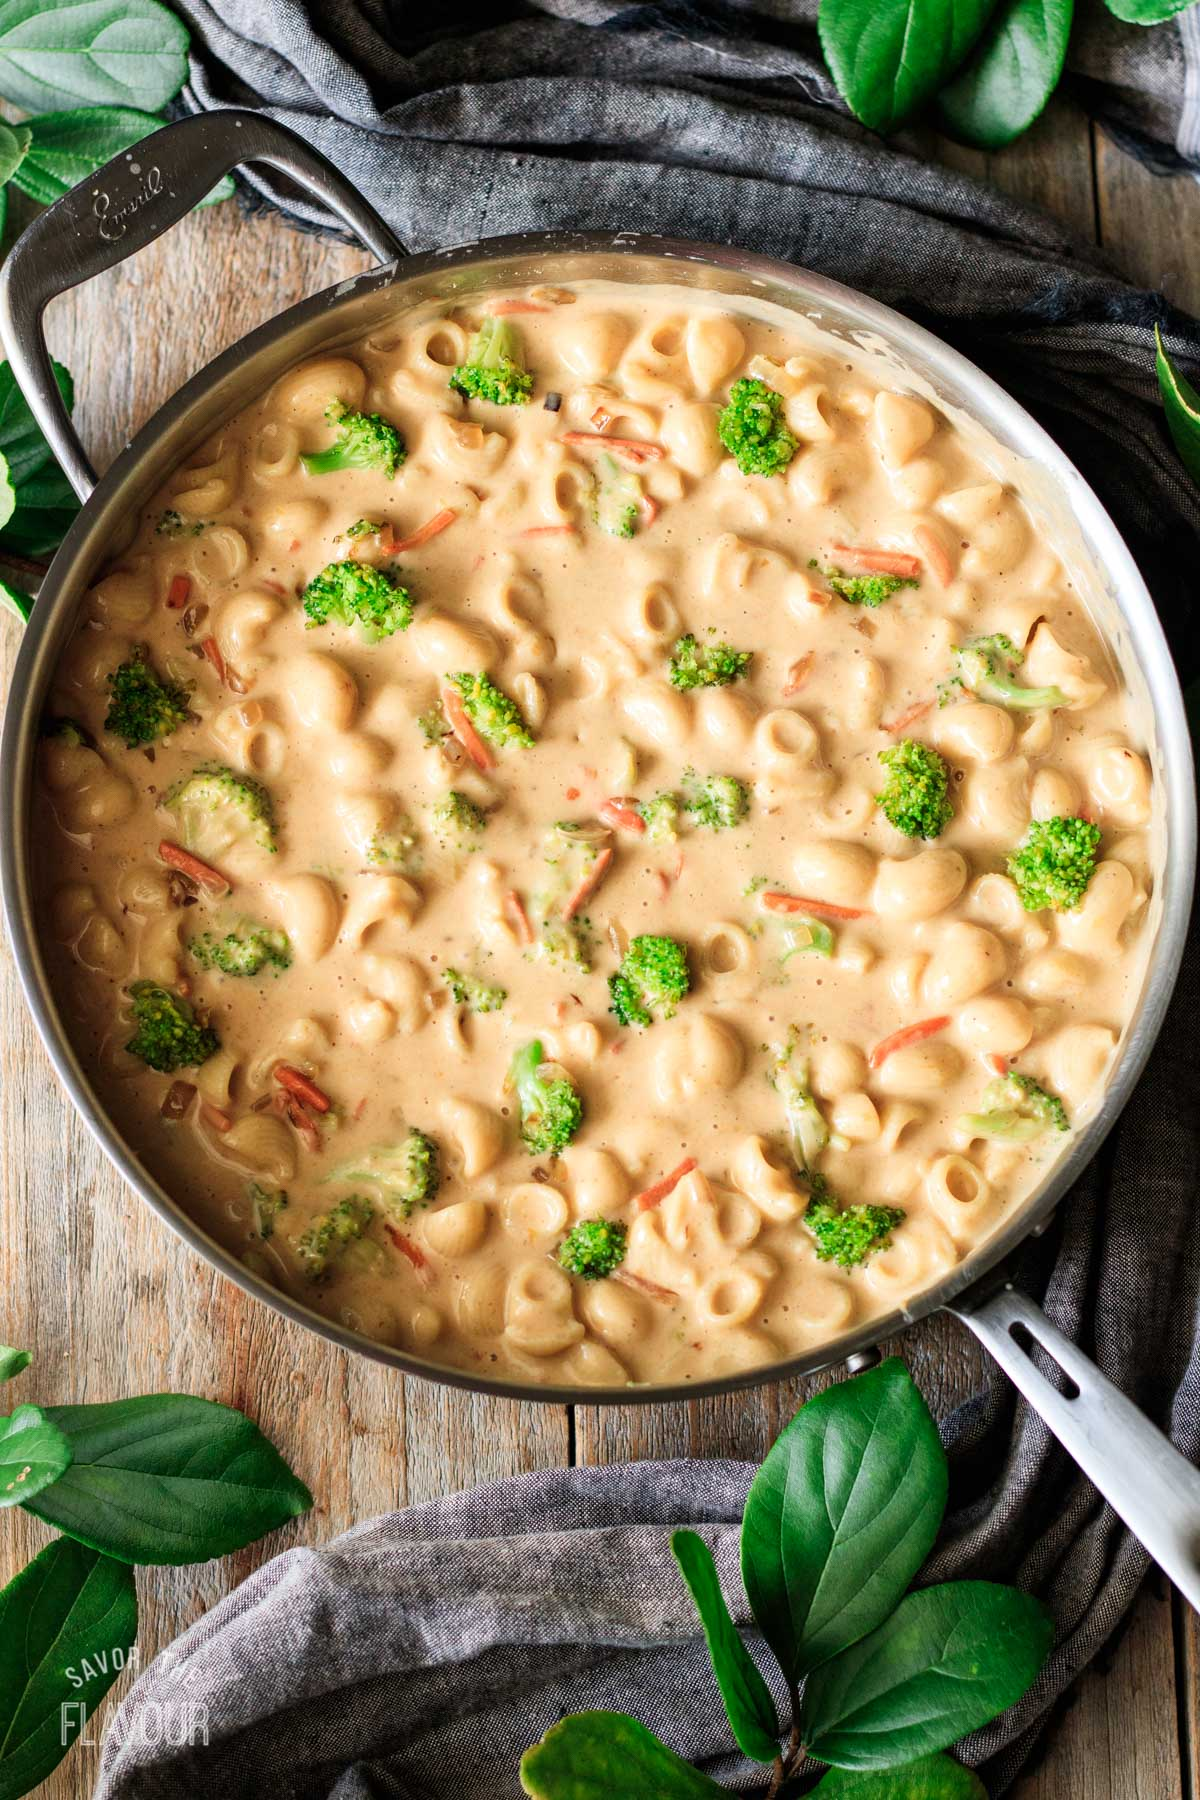 skillet full of Panera broccoli cheddar mac and cheese